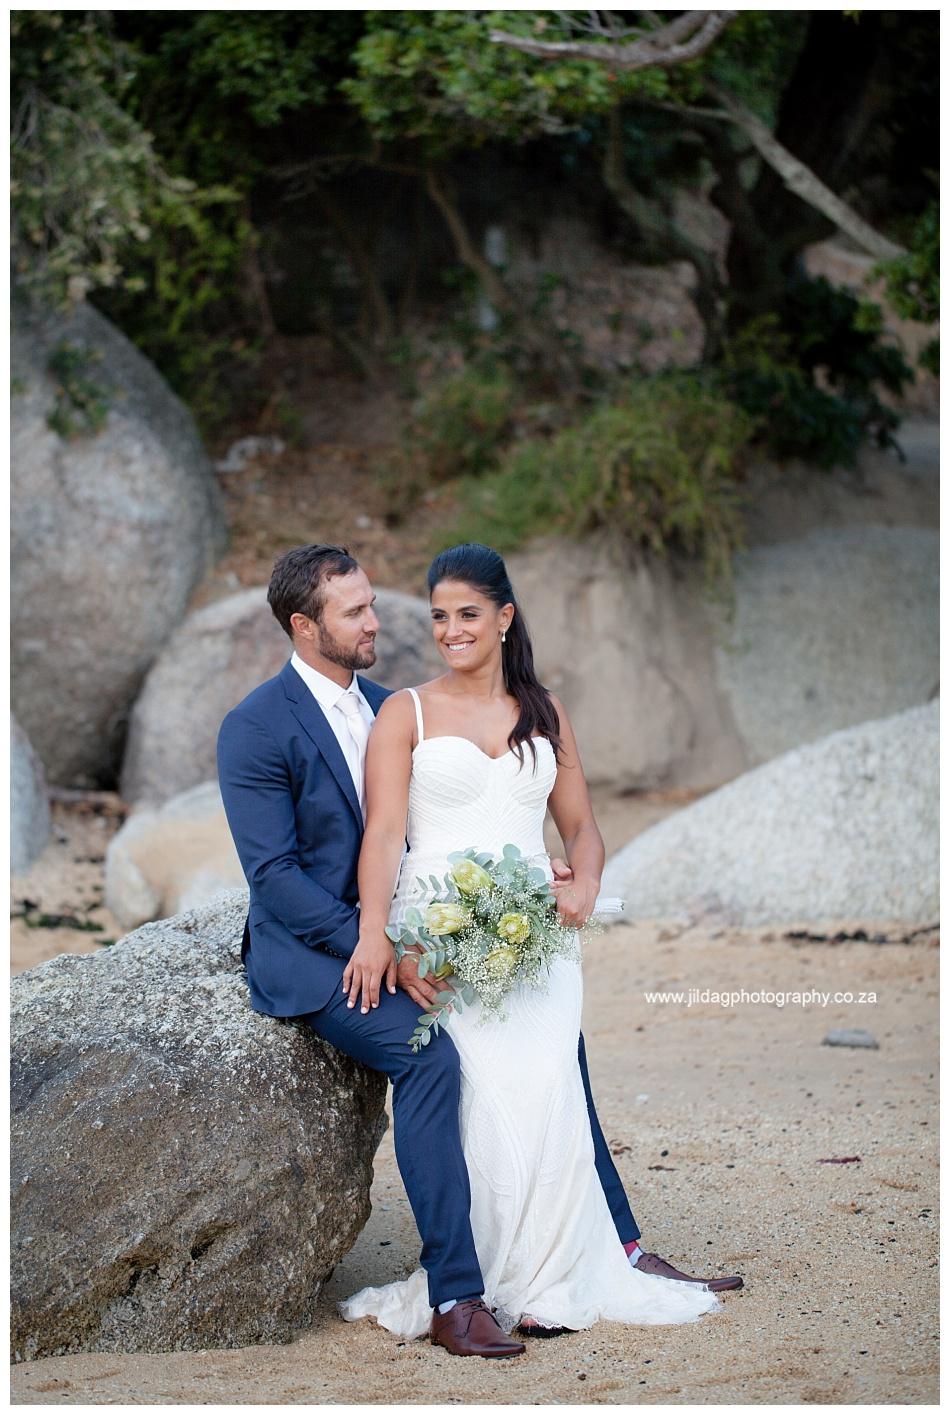 Jilda-G-Photography-12-Apostles-wedding_1776